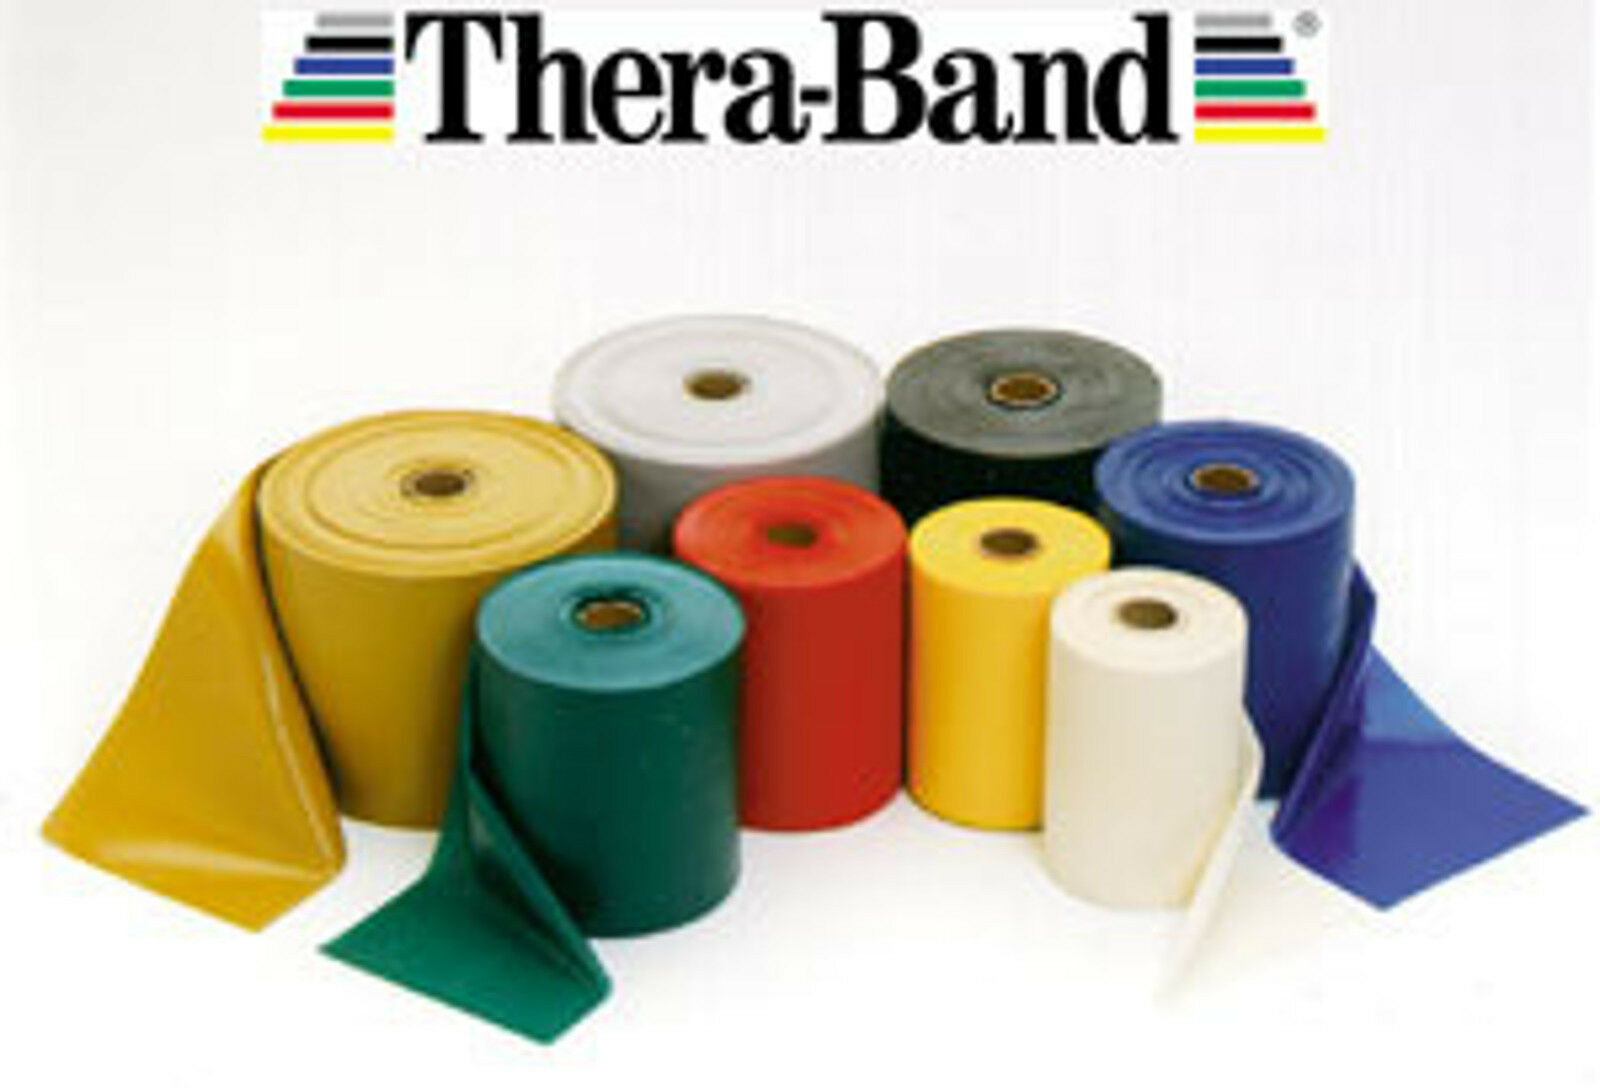 TheraBand thera-band bandes de résistance NHS.. exercice NHS.. résistance Pilates Yoga physiothérapie 1a20d7